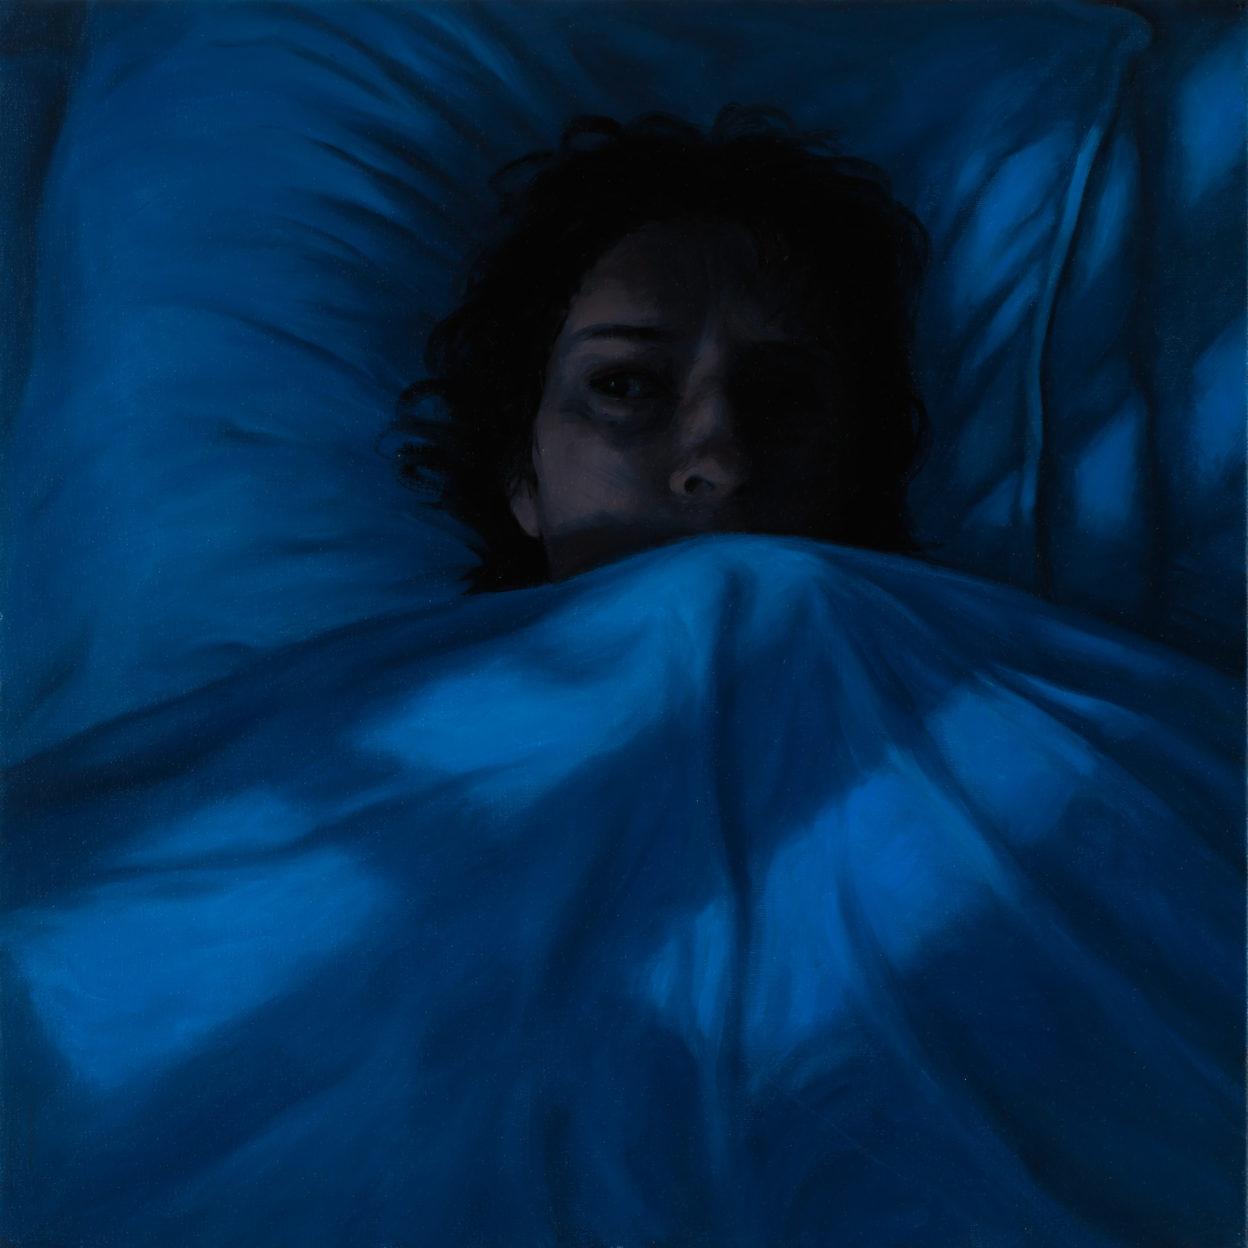 IVANA LOMOVÁ – THE BEDROOM PAINTINGS